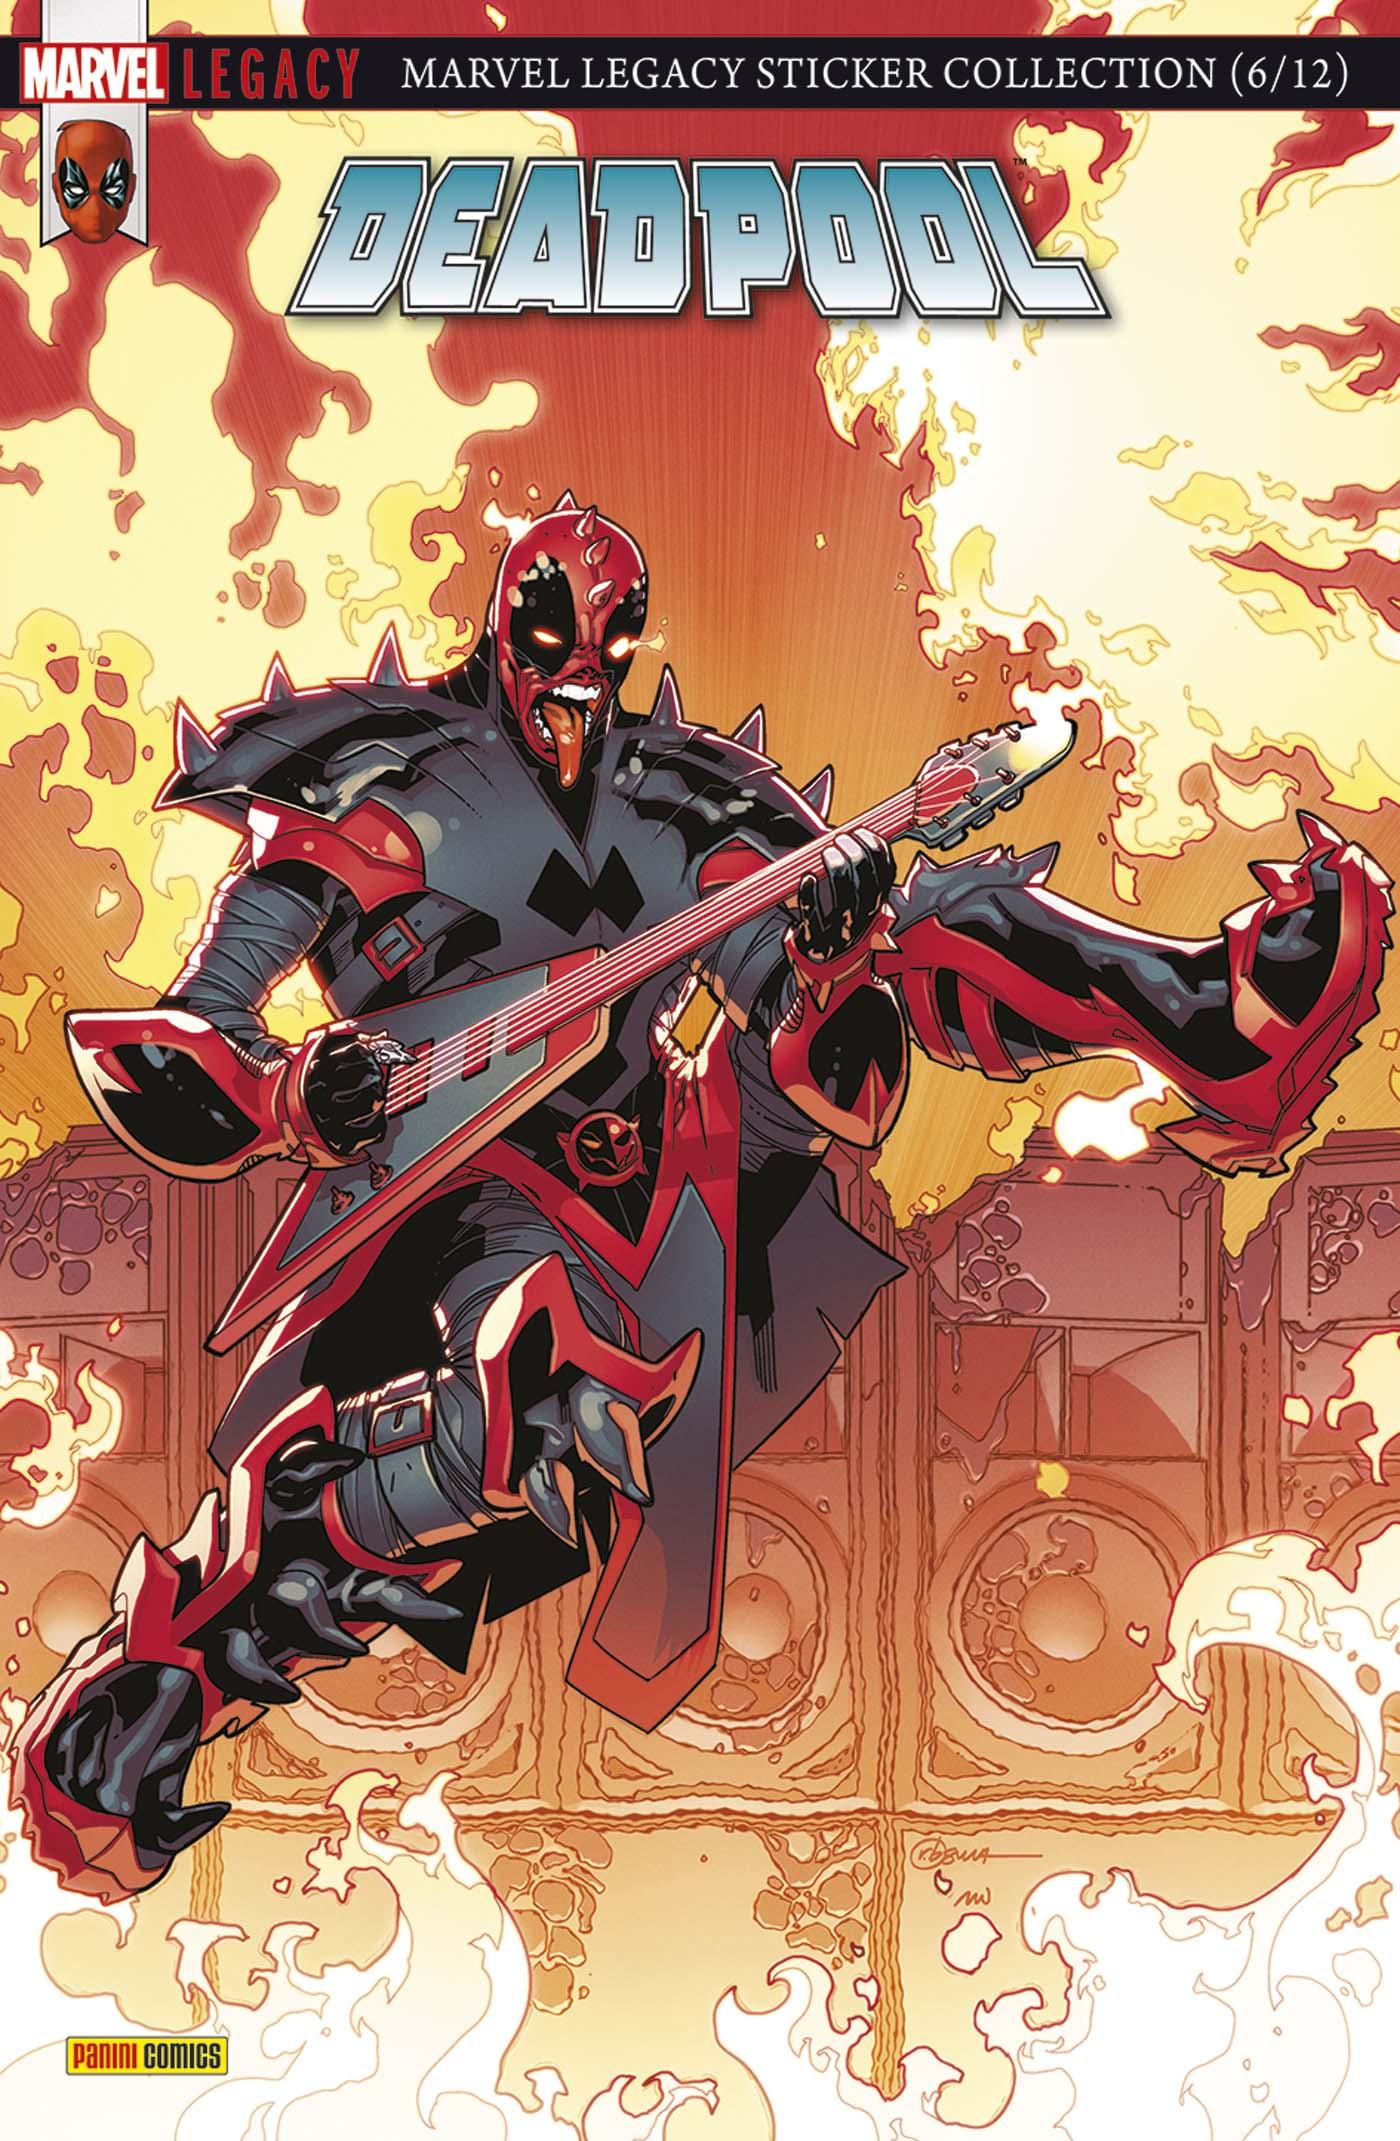 Marvel Legacy Deadpool n°2 (VF)